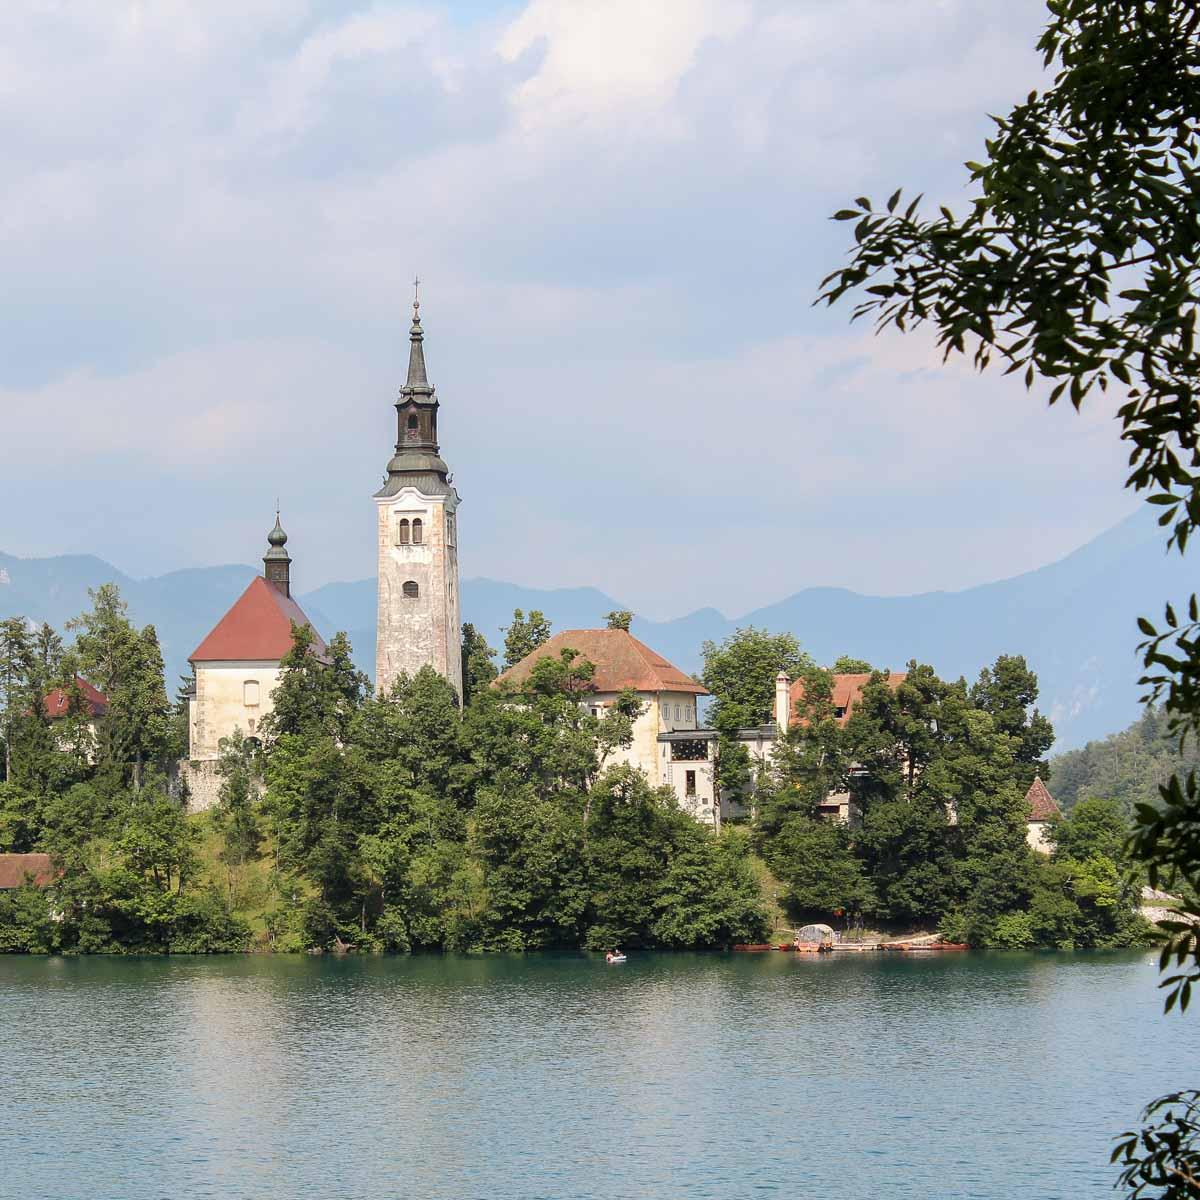 12x de allermooiste plekken in West-Slovenië (en tips om er te doen)